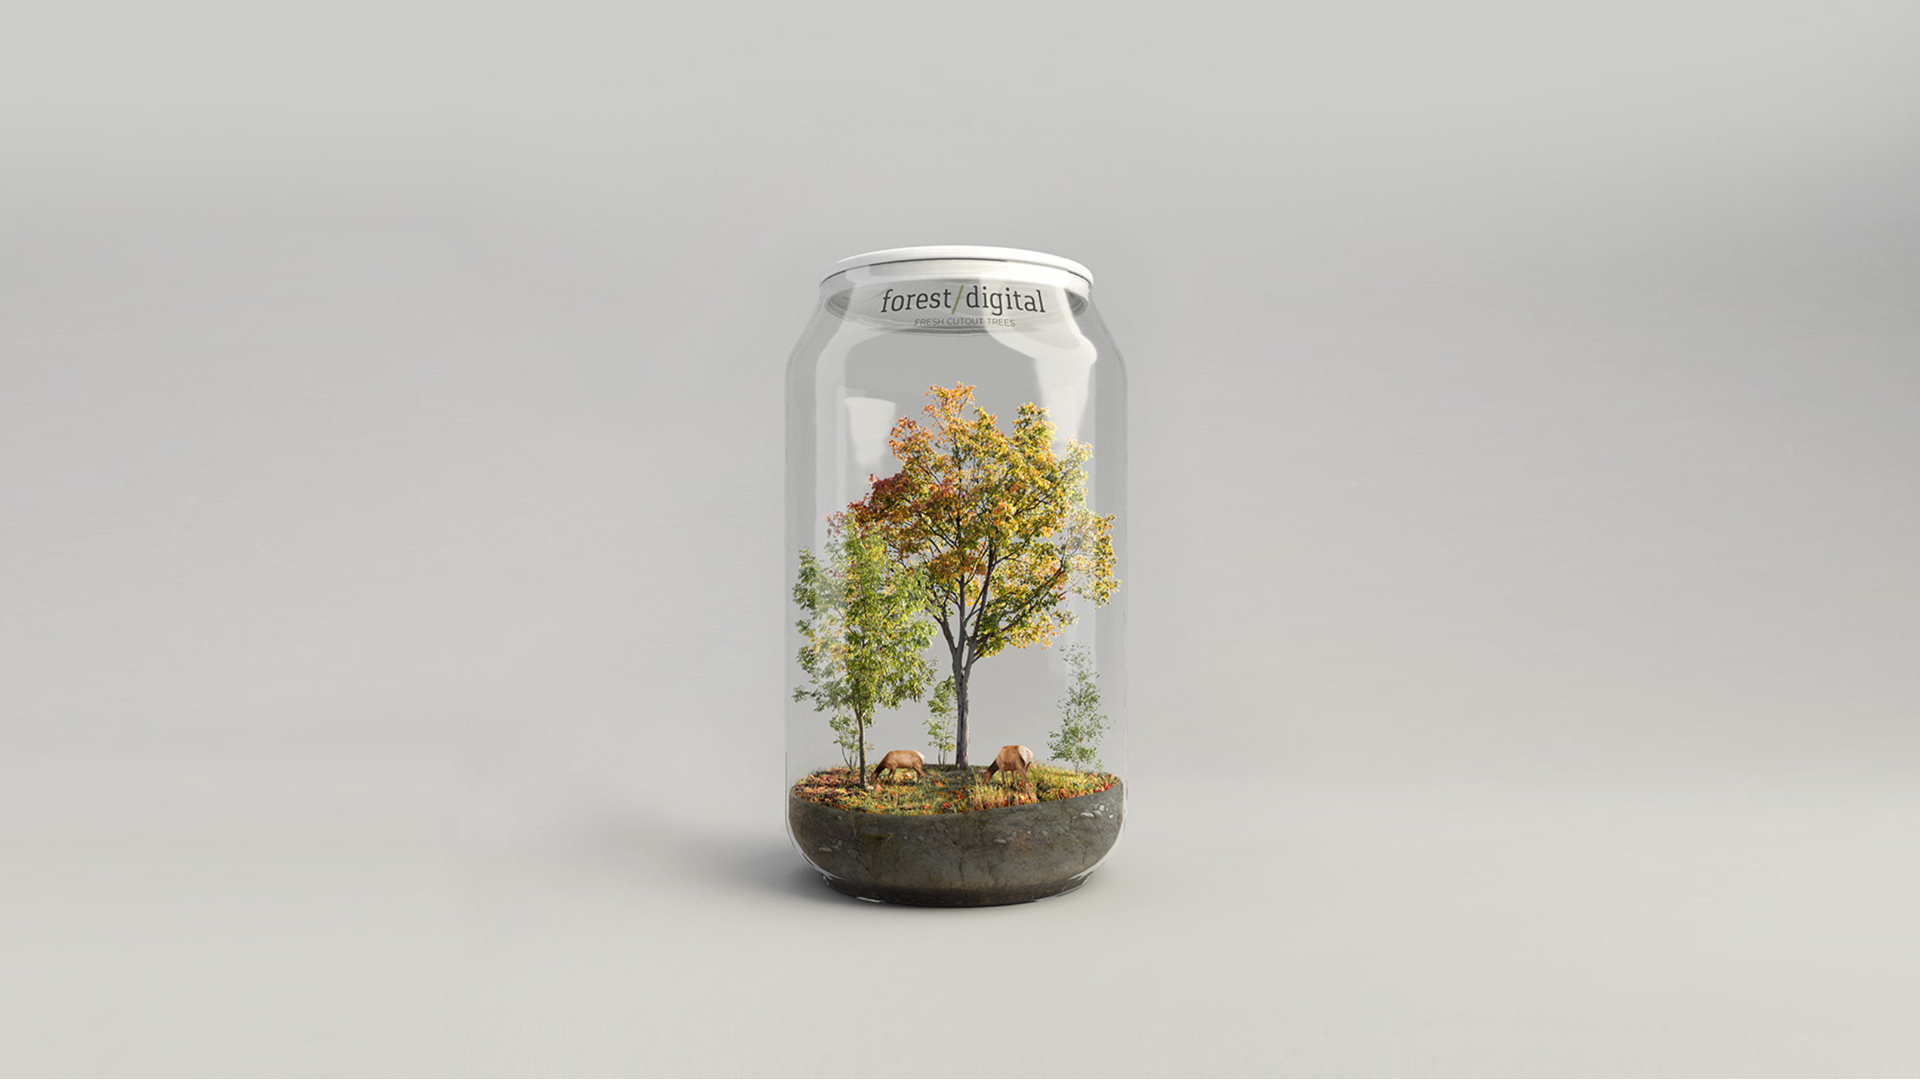 forest/digital Trees vol. 5 - Autumn Trees